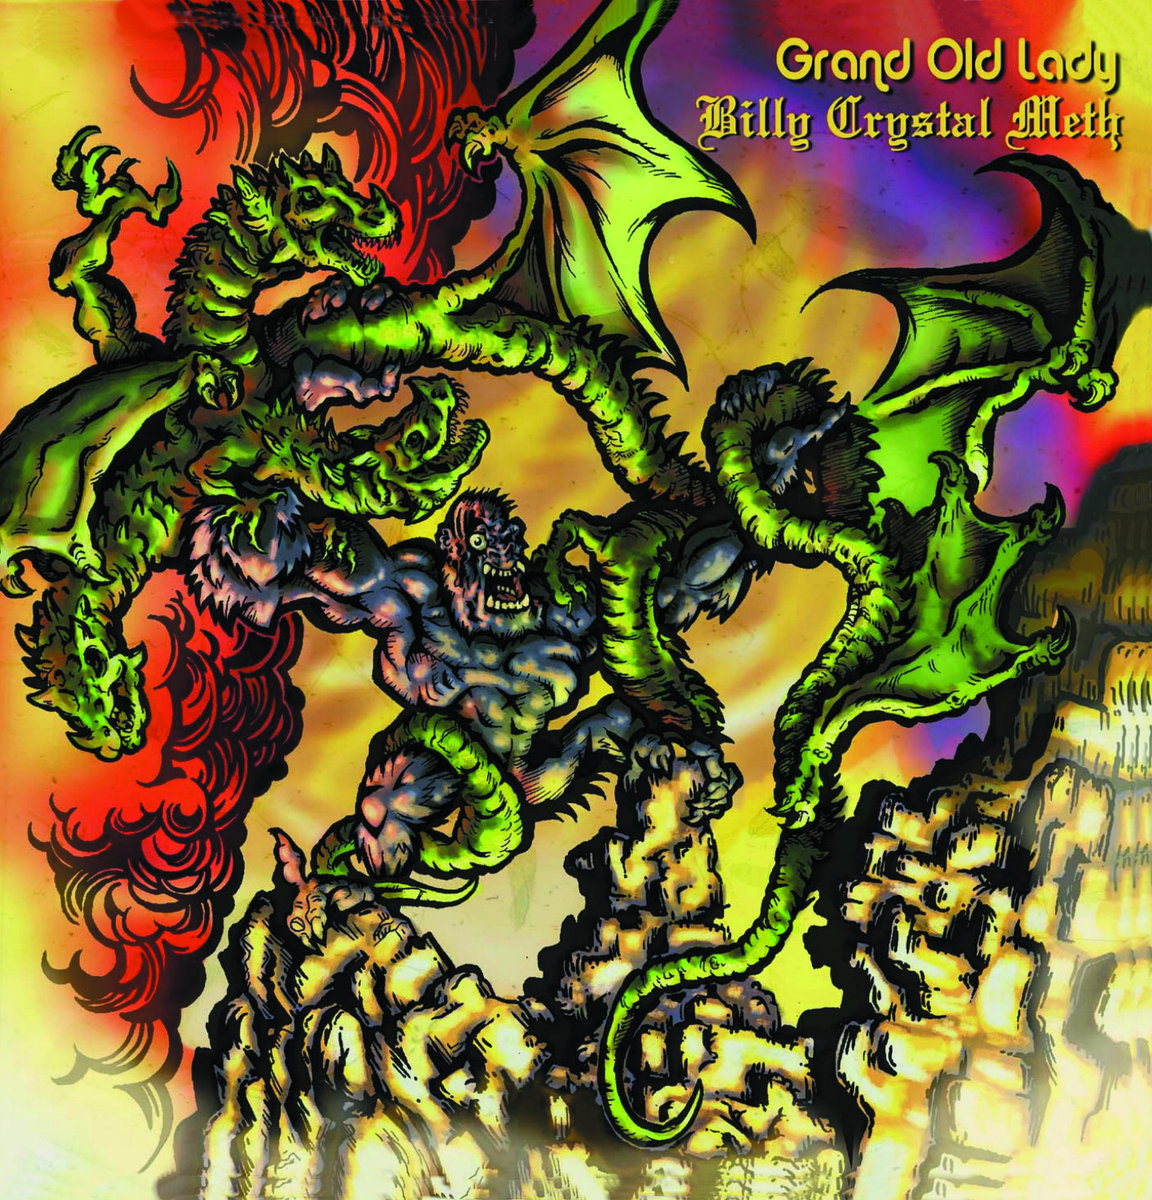 Billy Crystal Meth / Grand Old Lady (CD)